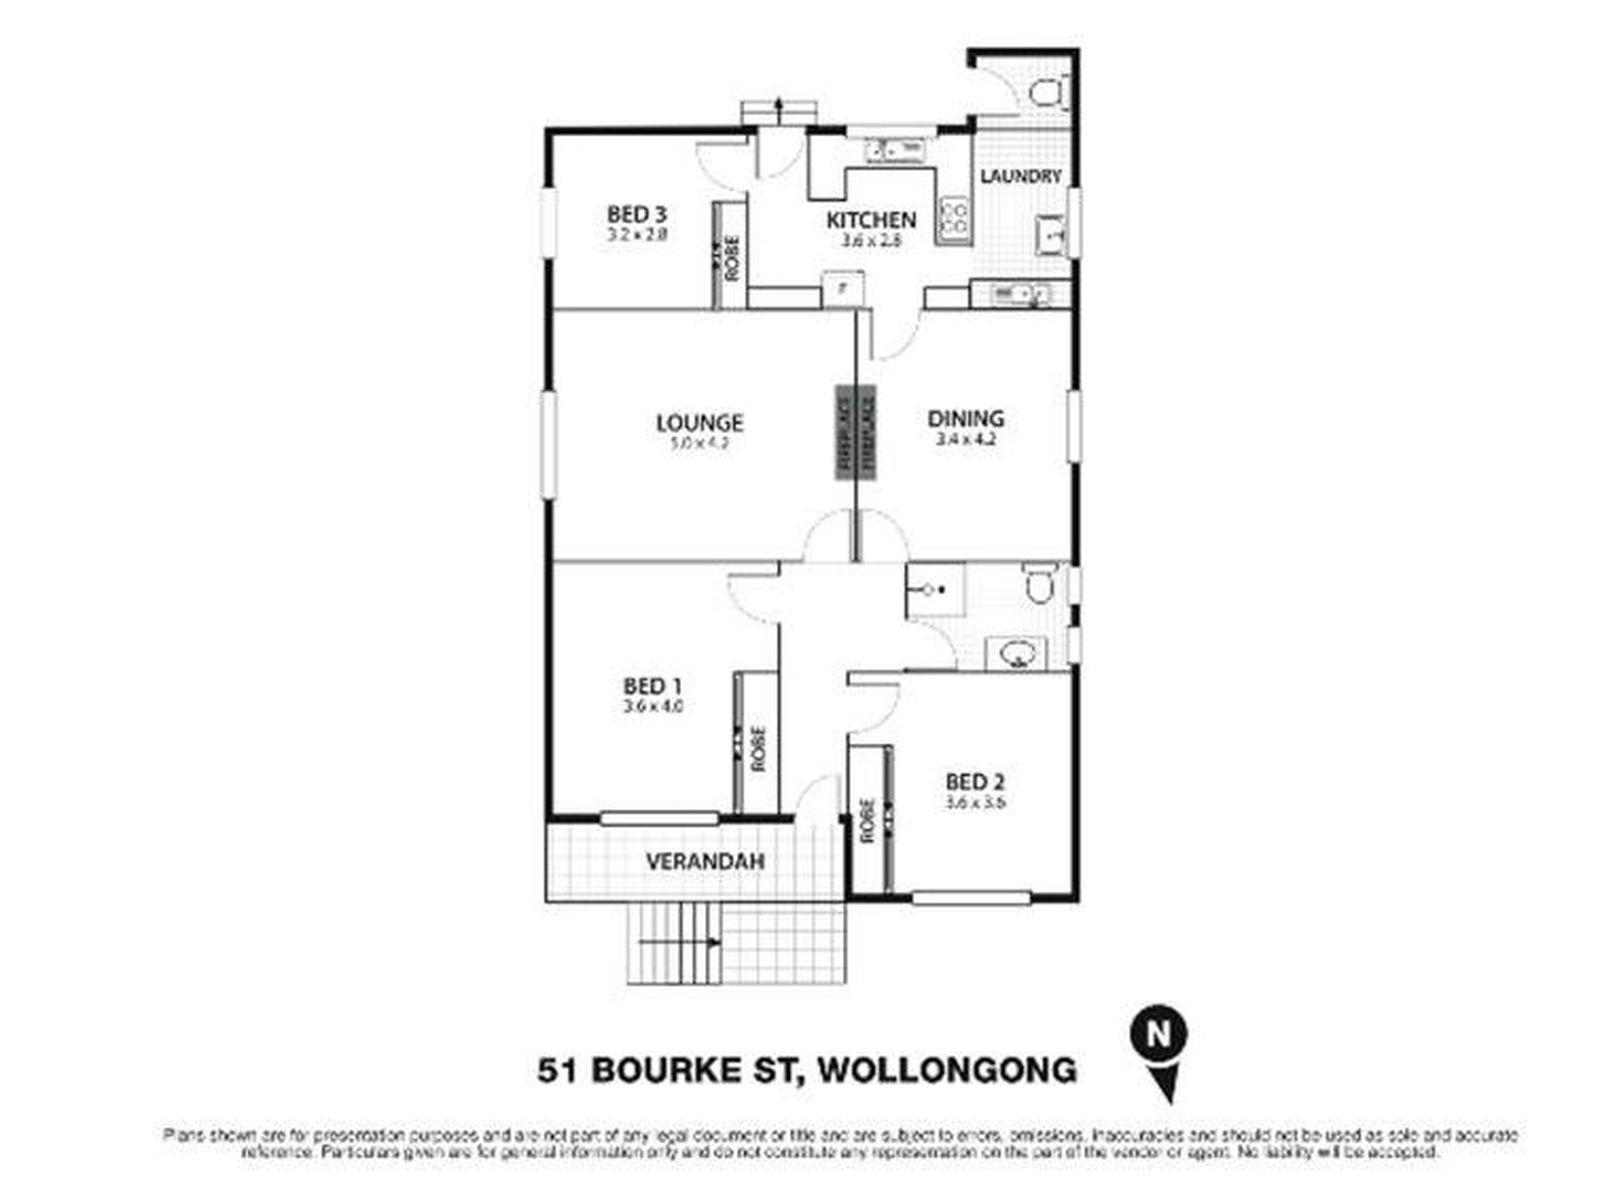 51 Bourke Street, North Wollongong